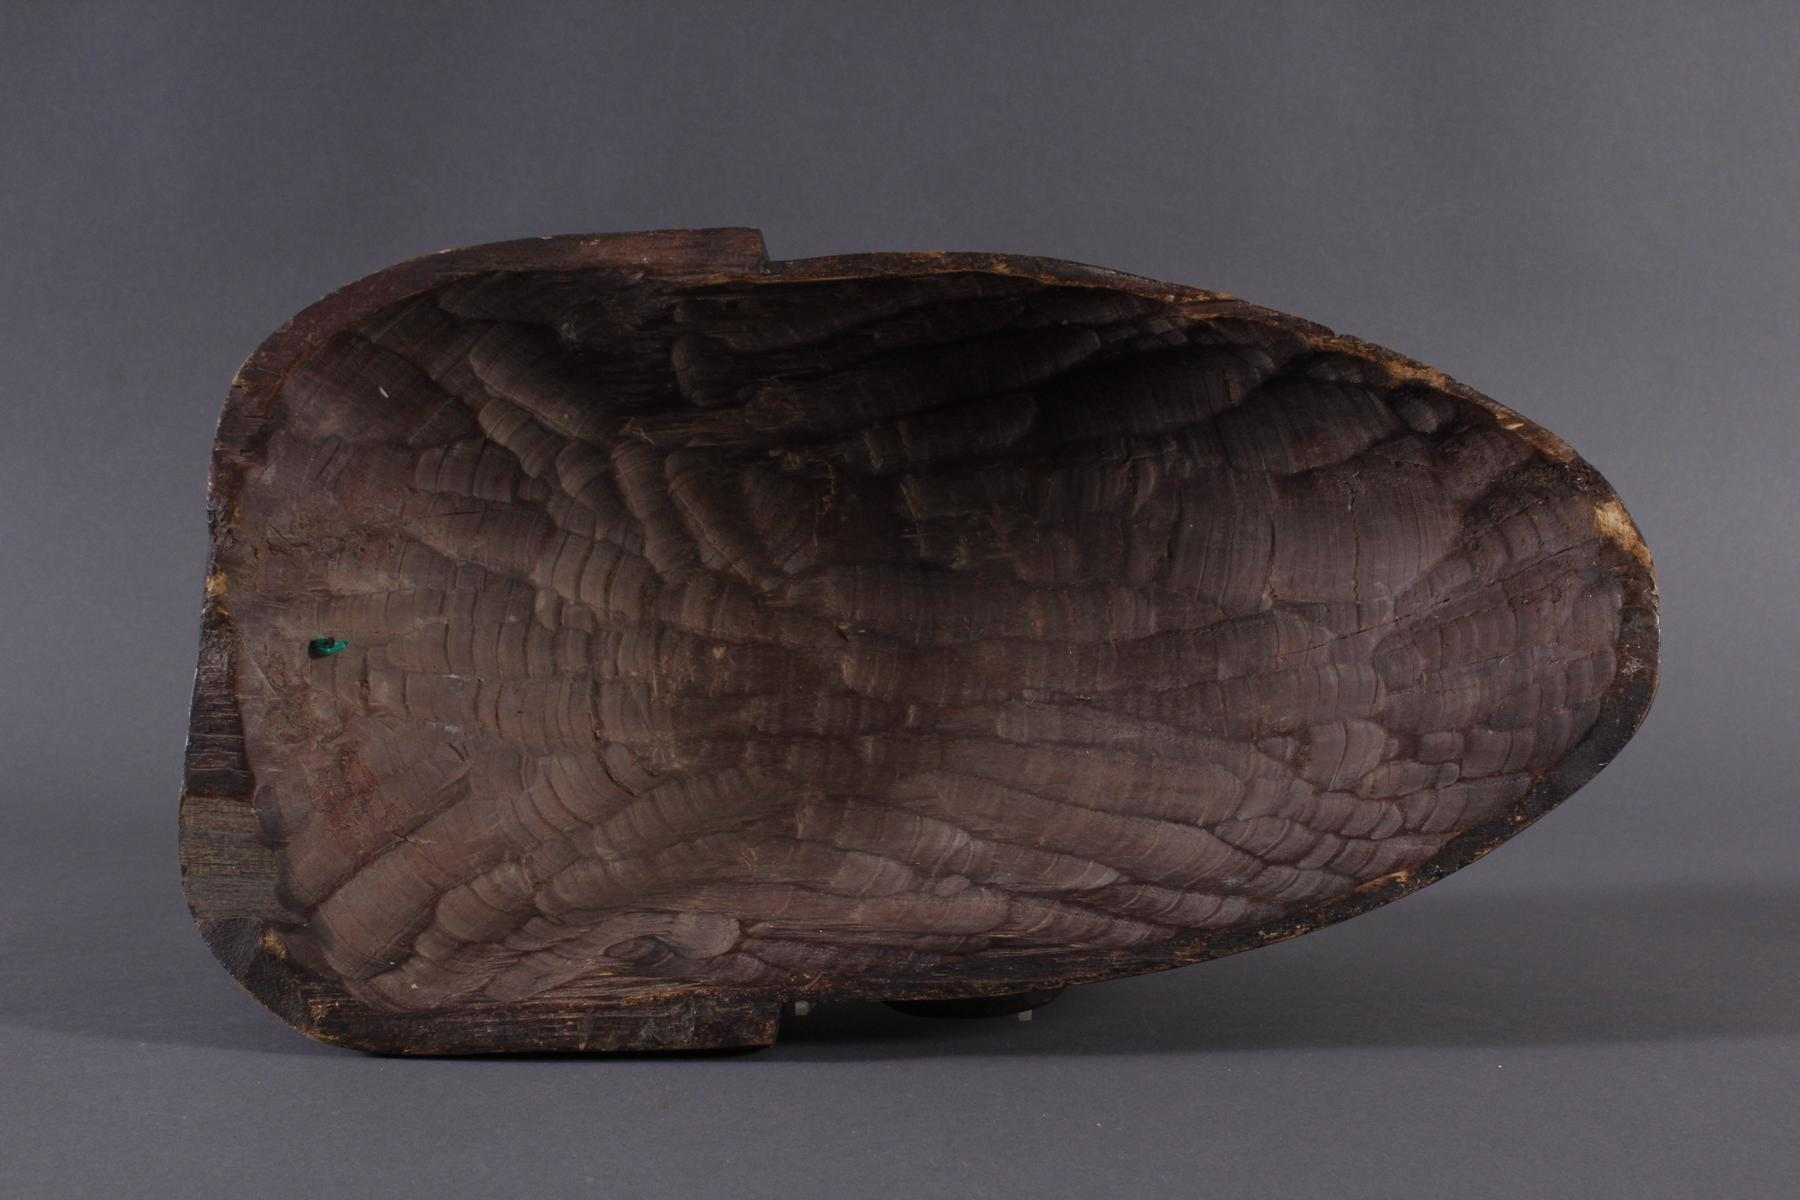 Antike Maske, Chokwe, Angola 1. Hälfte 20. Jh.Holz geschnitzt, dunkle Patina, Narbentatauierung, ca. - Bild 7 aus 7